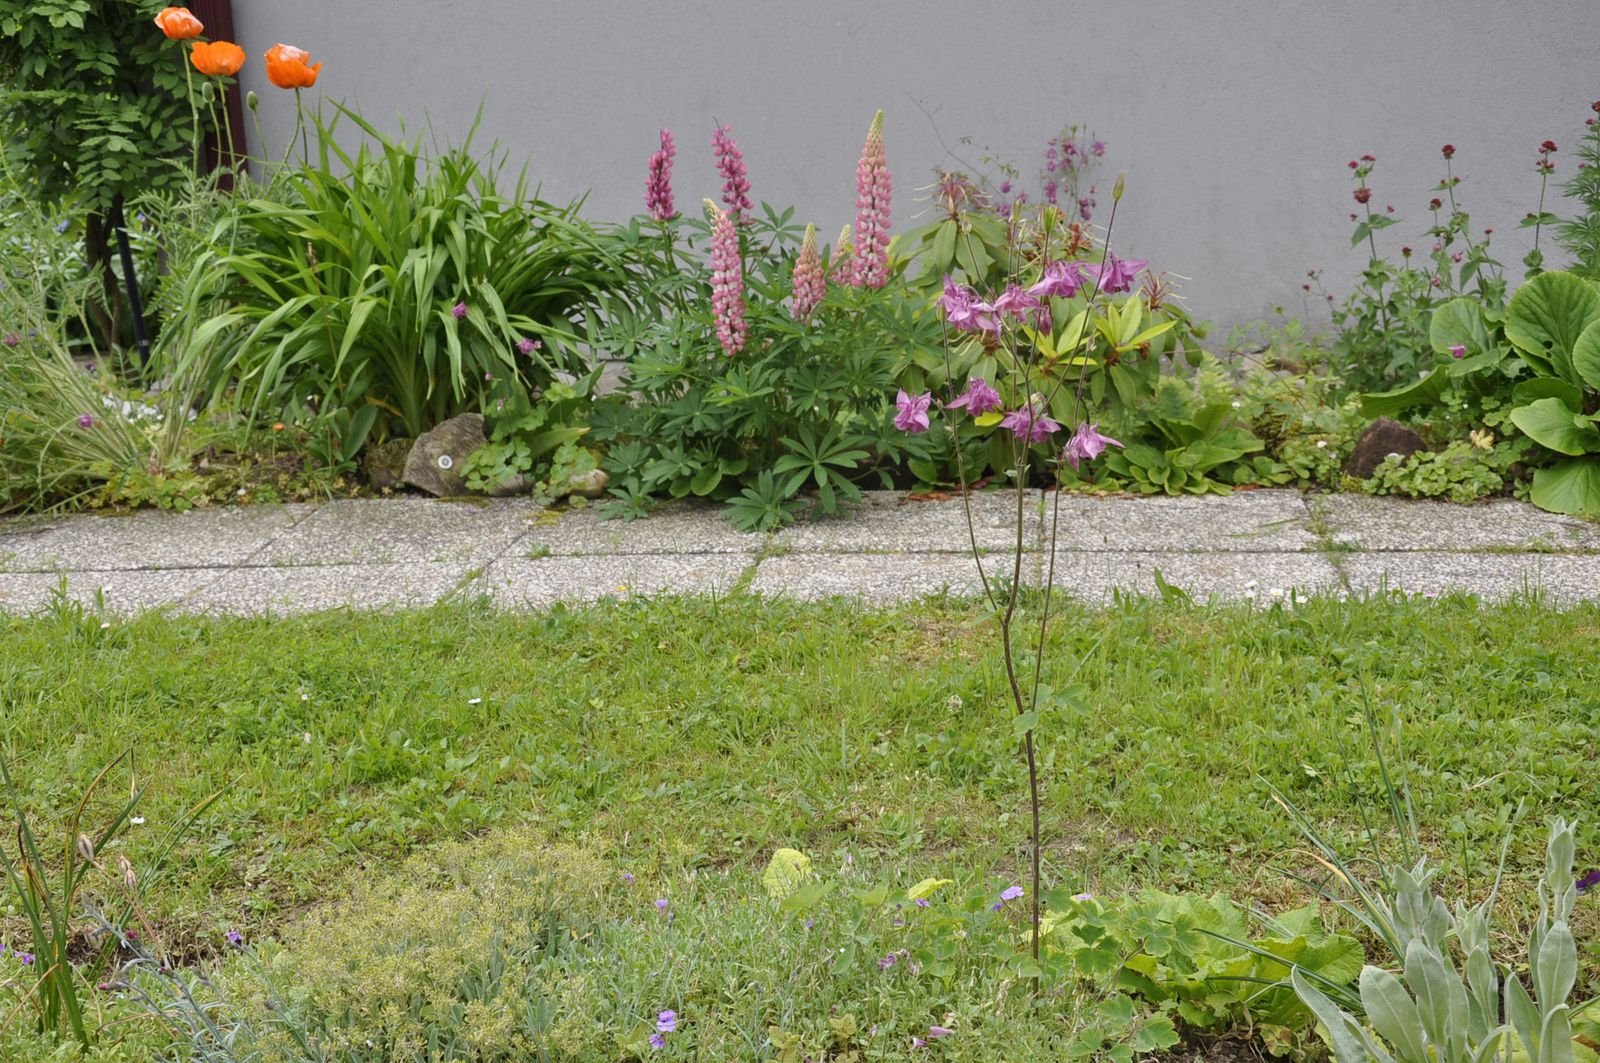 Jardin d agrement sans entretien mare with jardin d agrement sans entretien beliebt ides - Jardin d agrement sans entretien ...